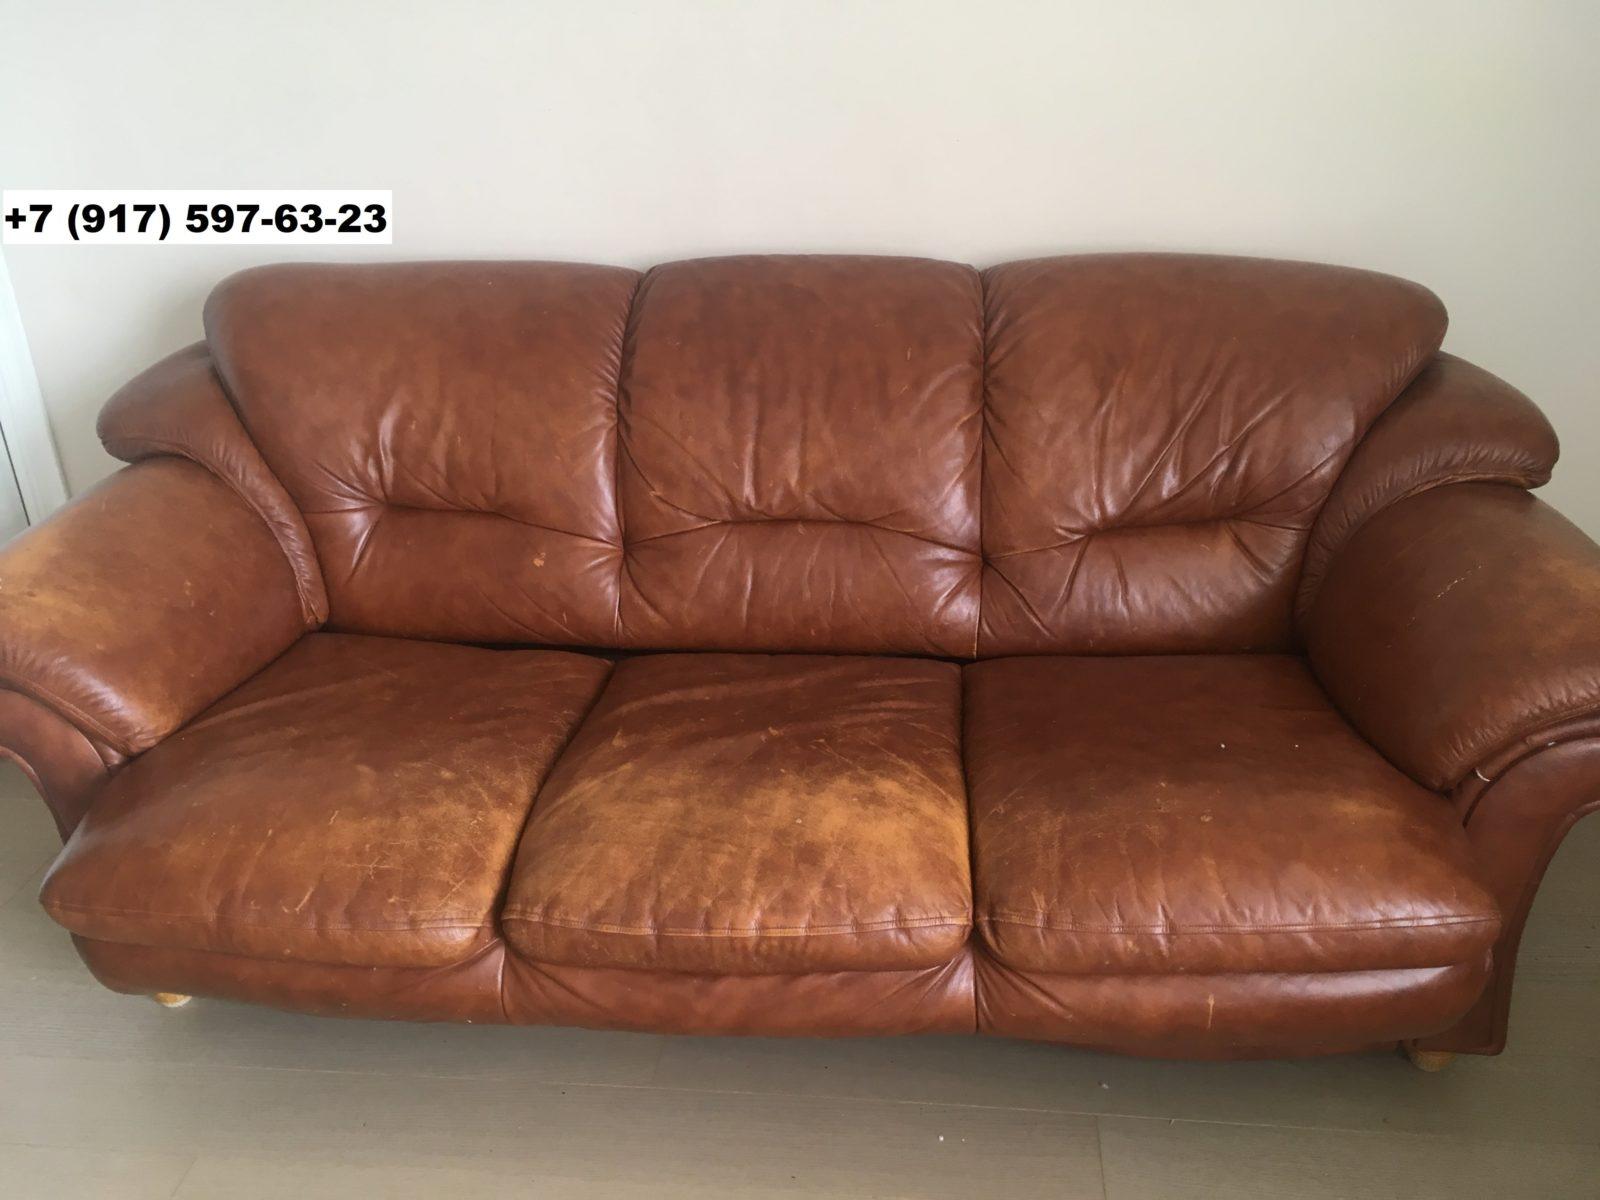 Перевозка дивана с грузчиками недорого - Москва | «Перевозки 978»